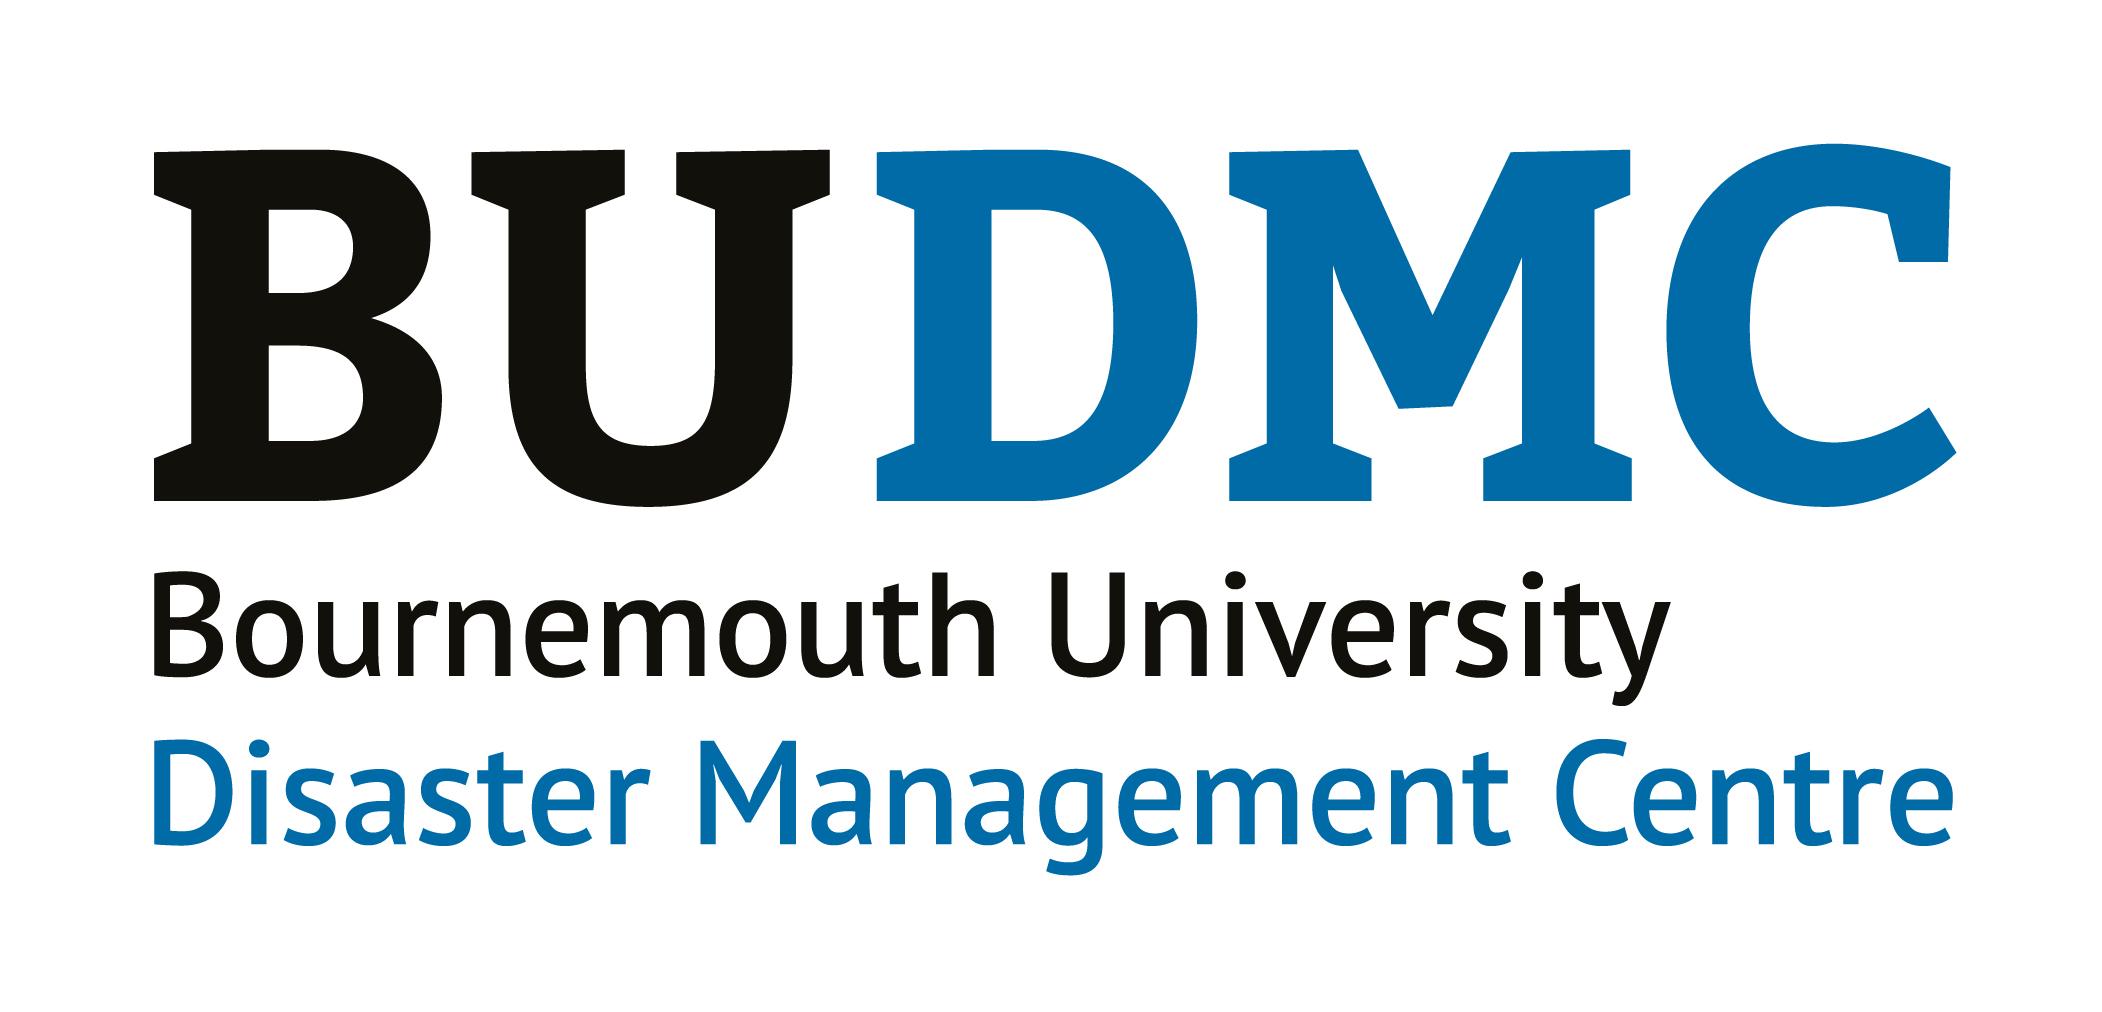 BU Disaster Management Centre logo